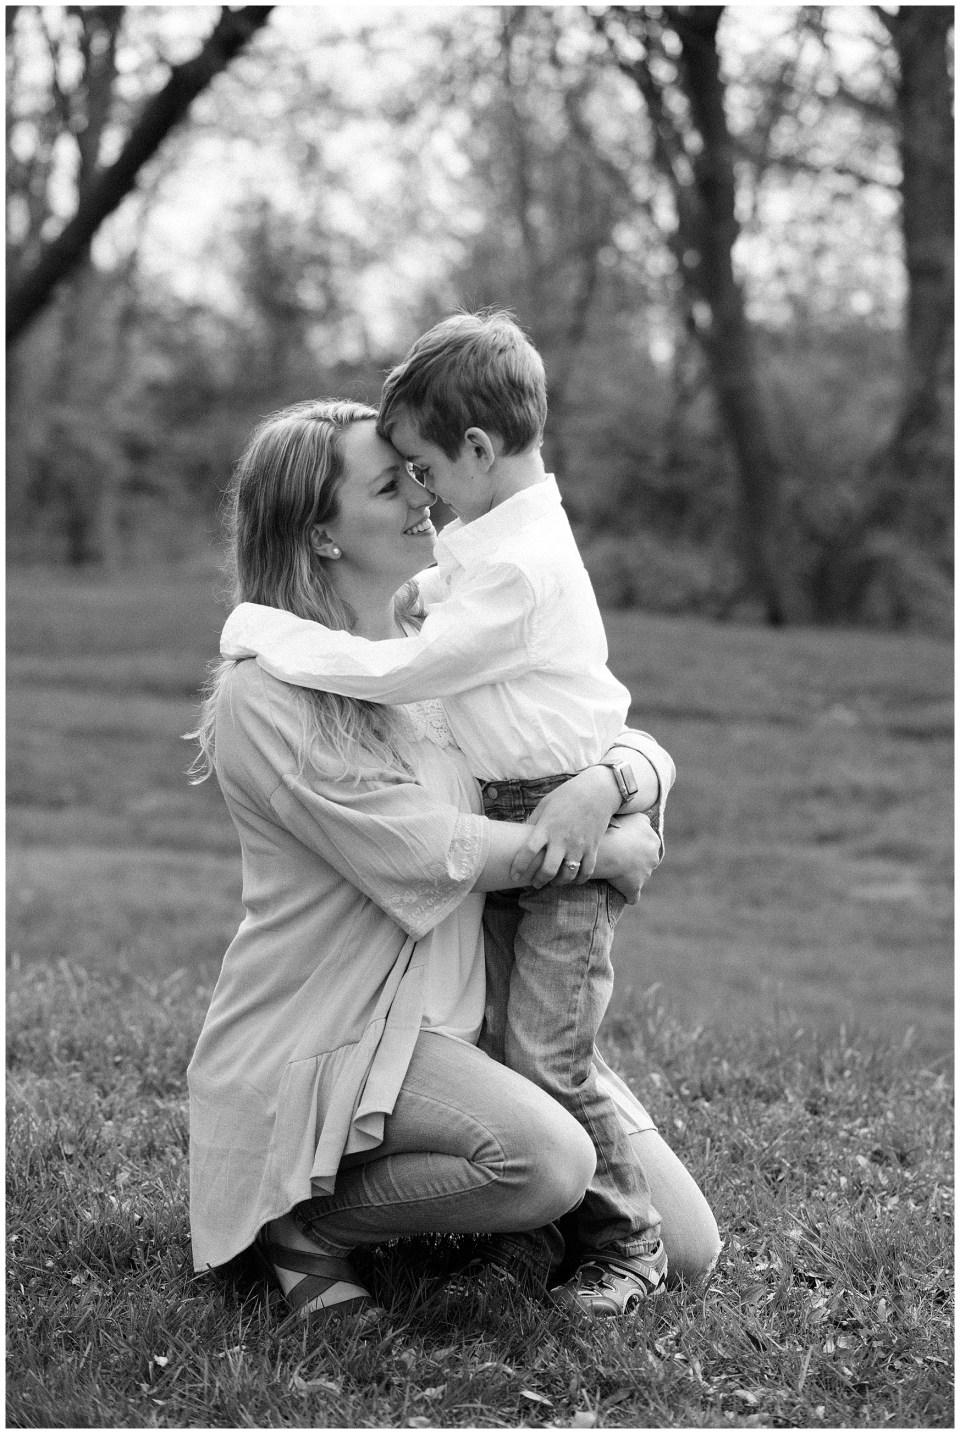 Shriver Family Portraits by Beth T_Jenna Shriver Photography_0004.jpg